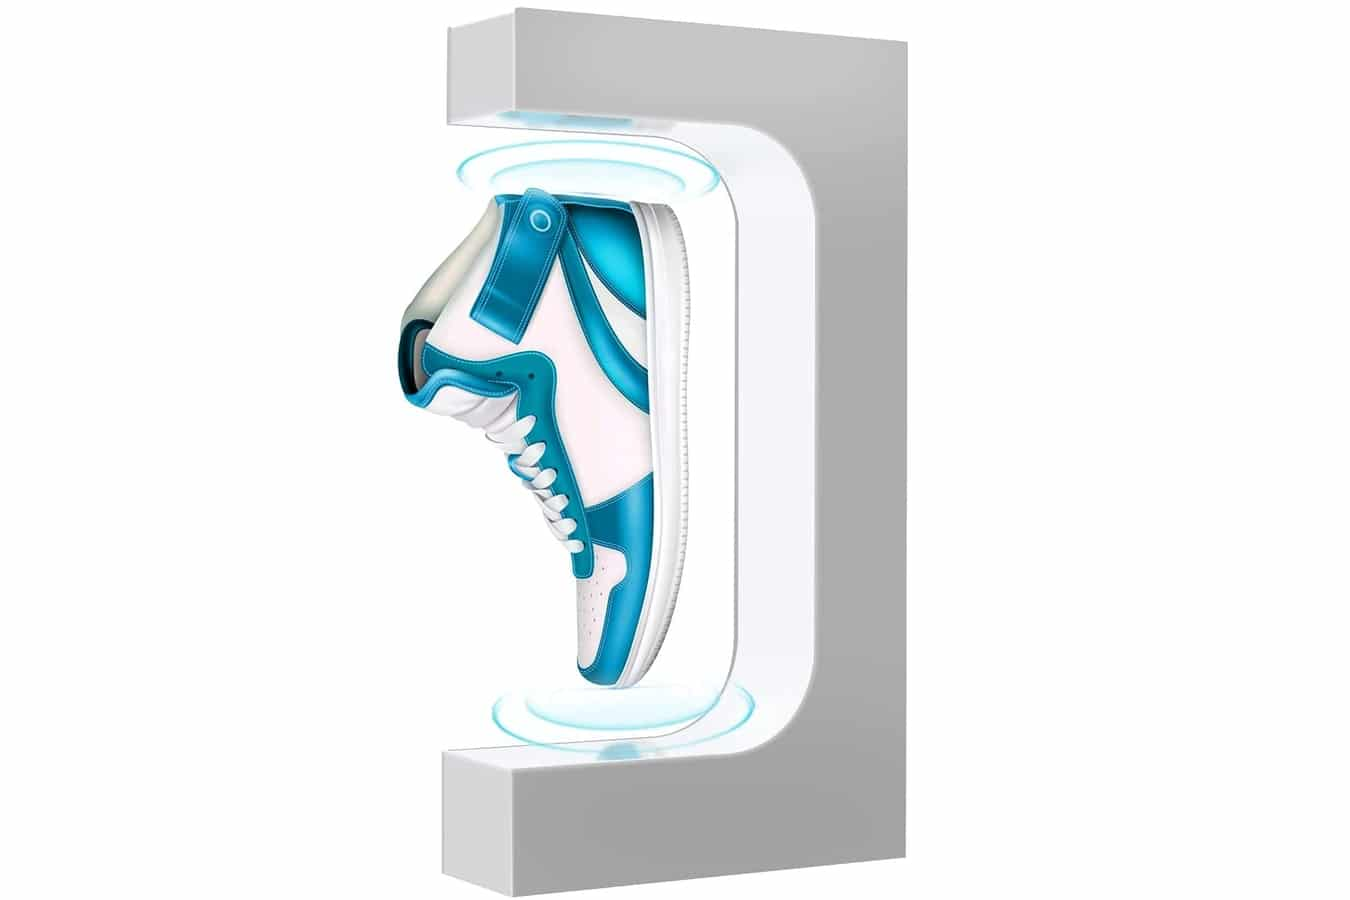 ur c floating ultra magnetic suspension shoes stand levitating floating shoes display